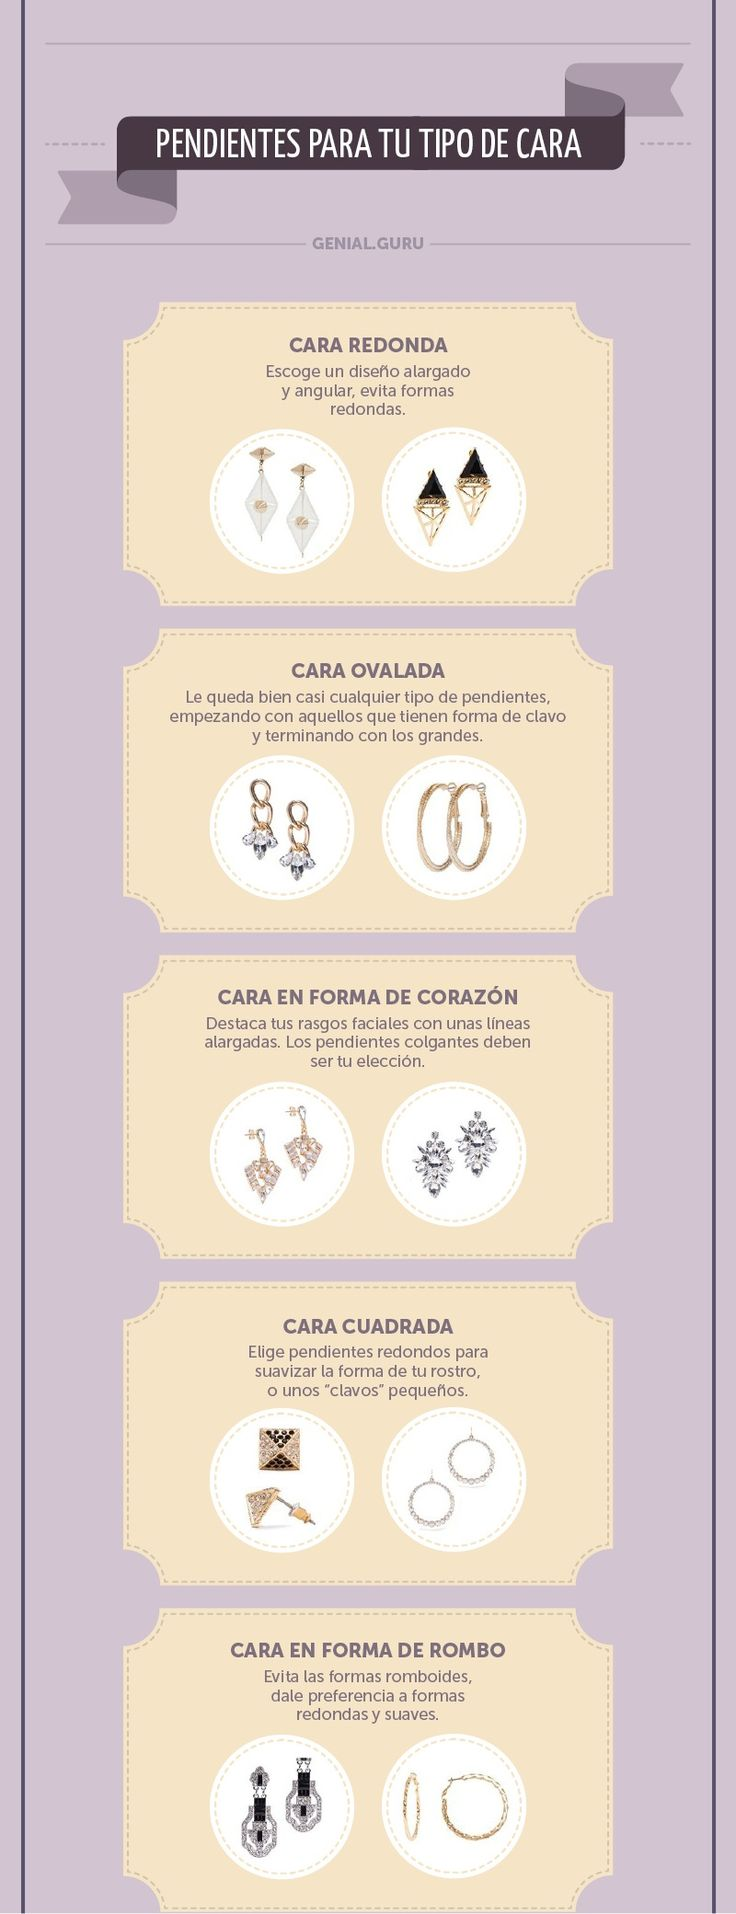 How to choose earrings according to your face shape. Como escoger aretes de acuerdo a la forma de tu cara.